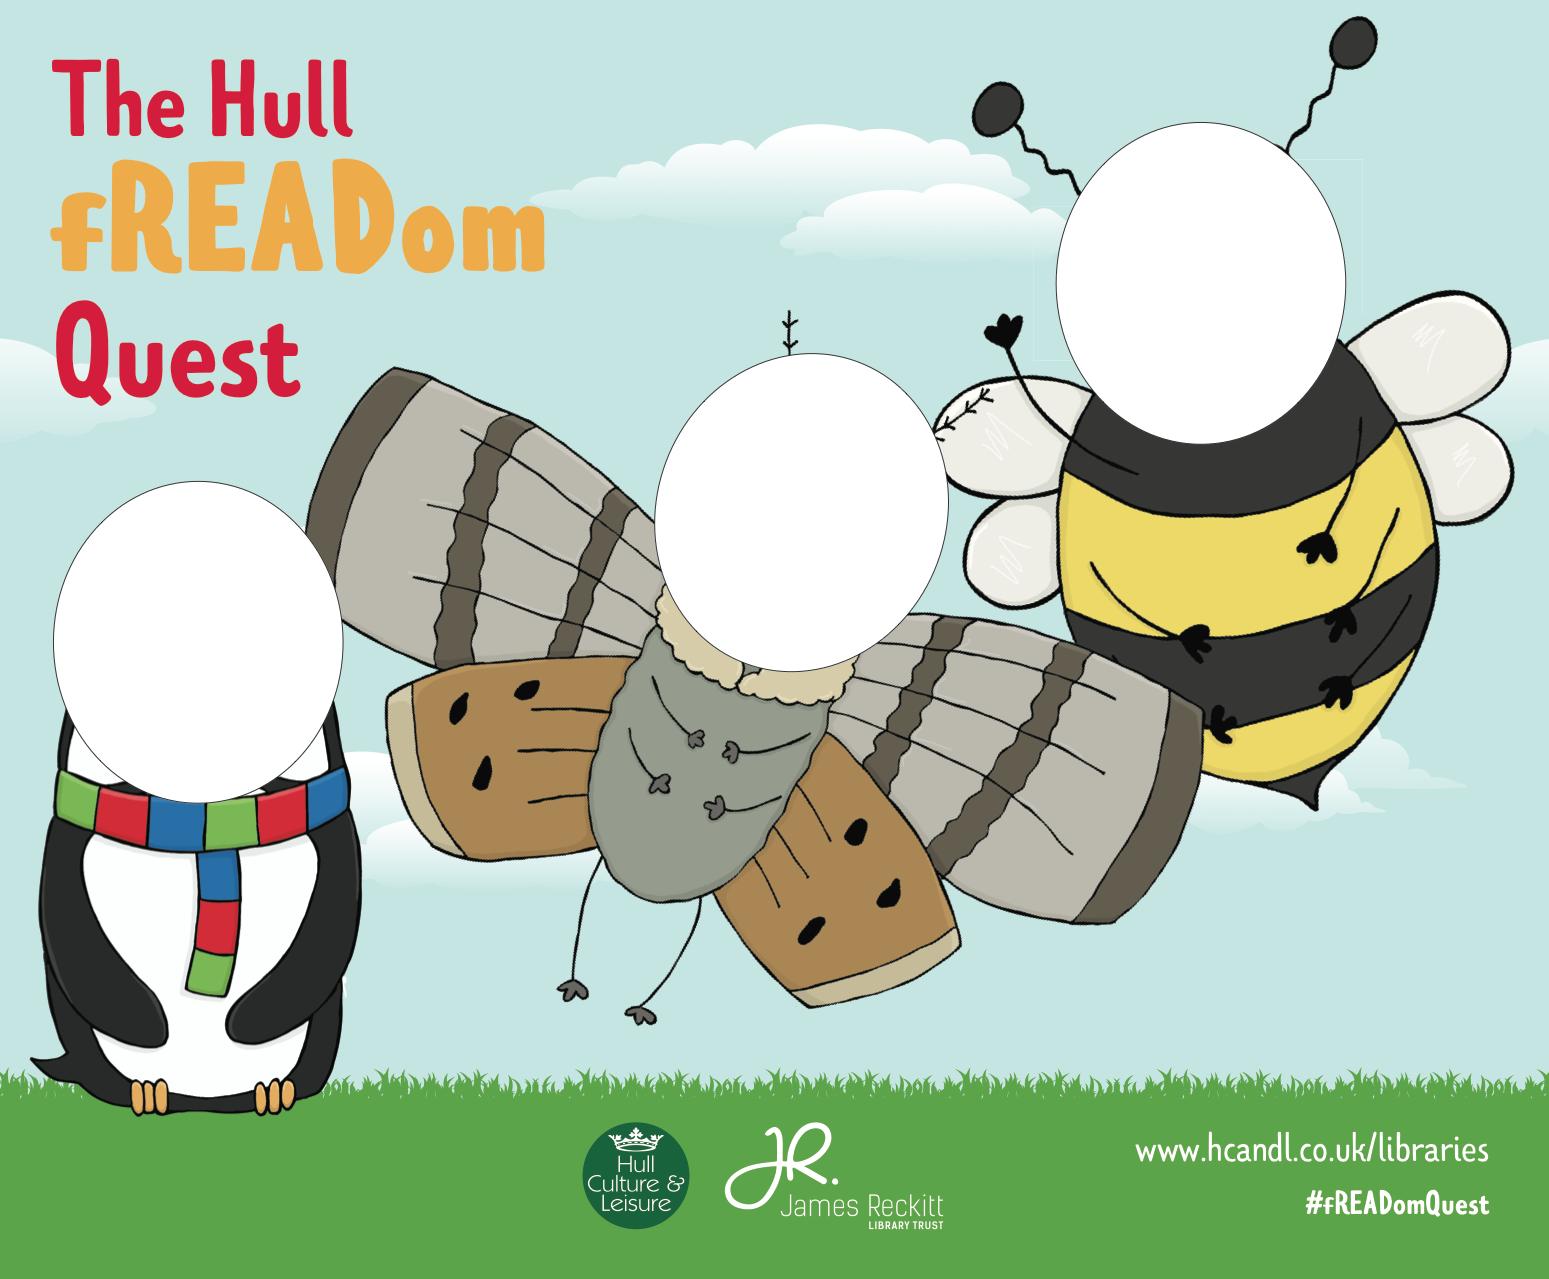 The Hull f REA Ddom Quest